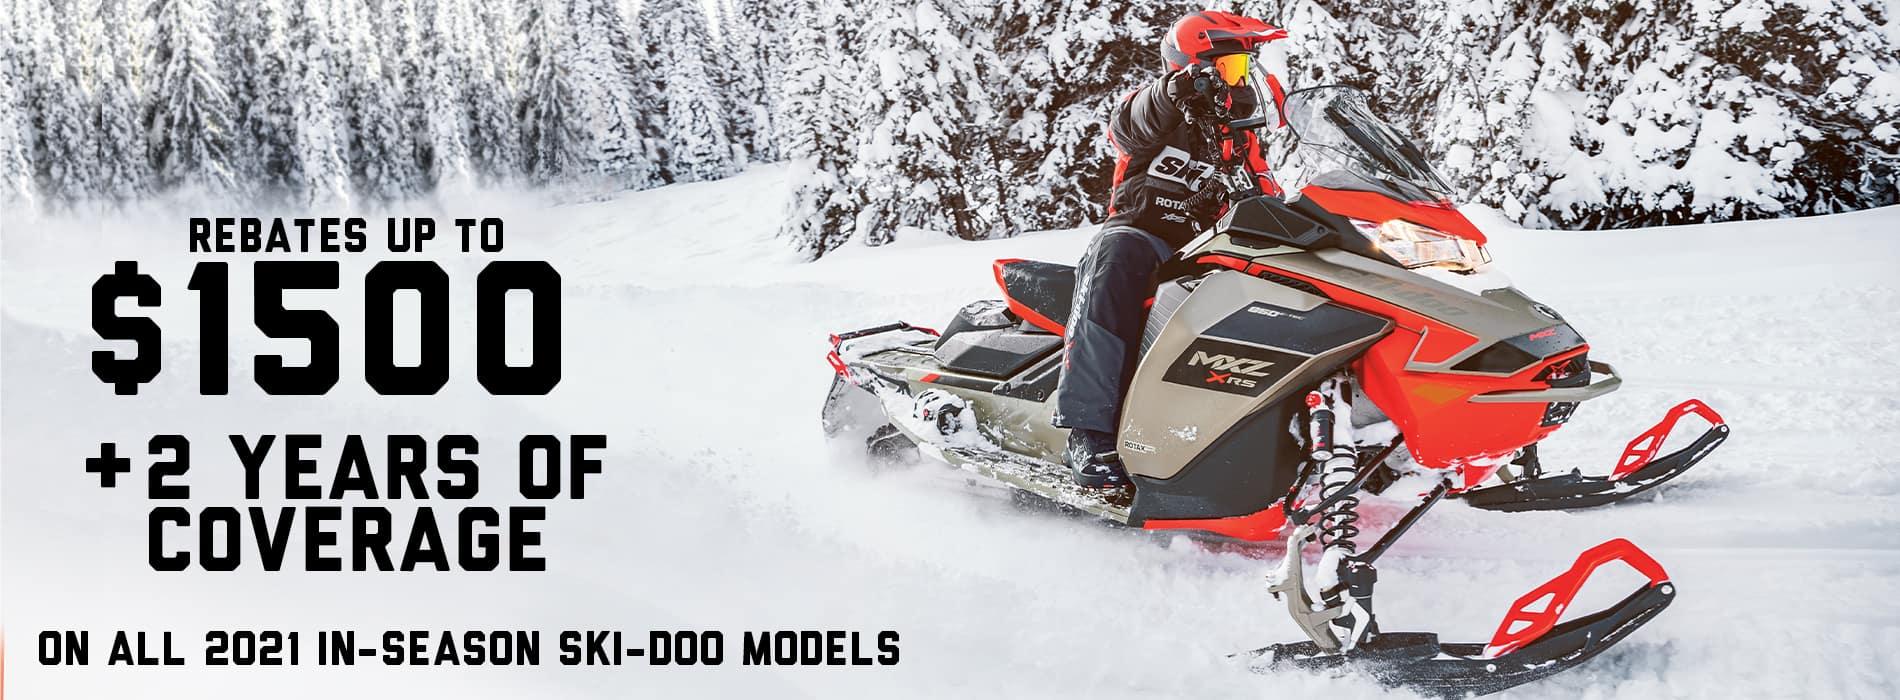 Ski-Doo YELLOW TAG SALES EVENT 11-2020